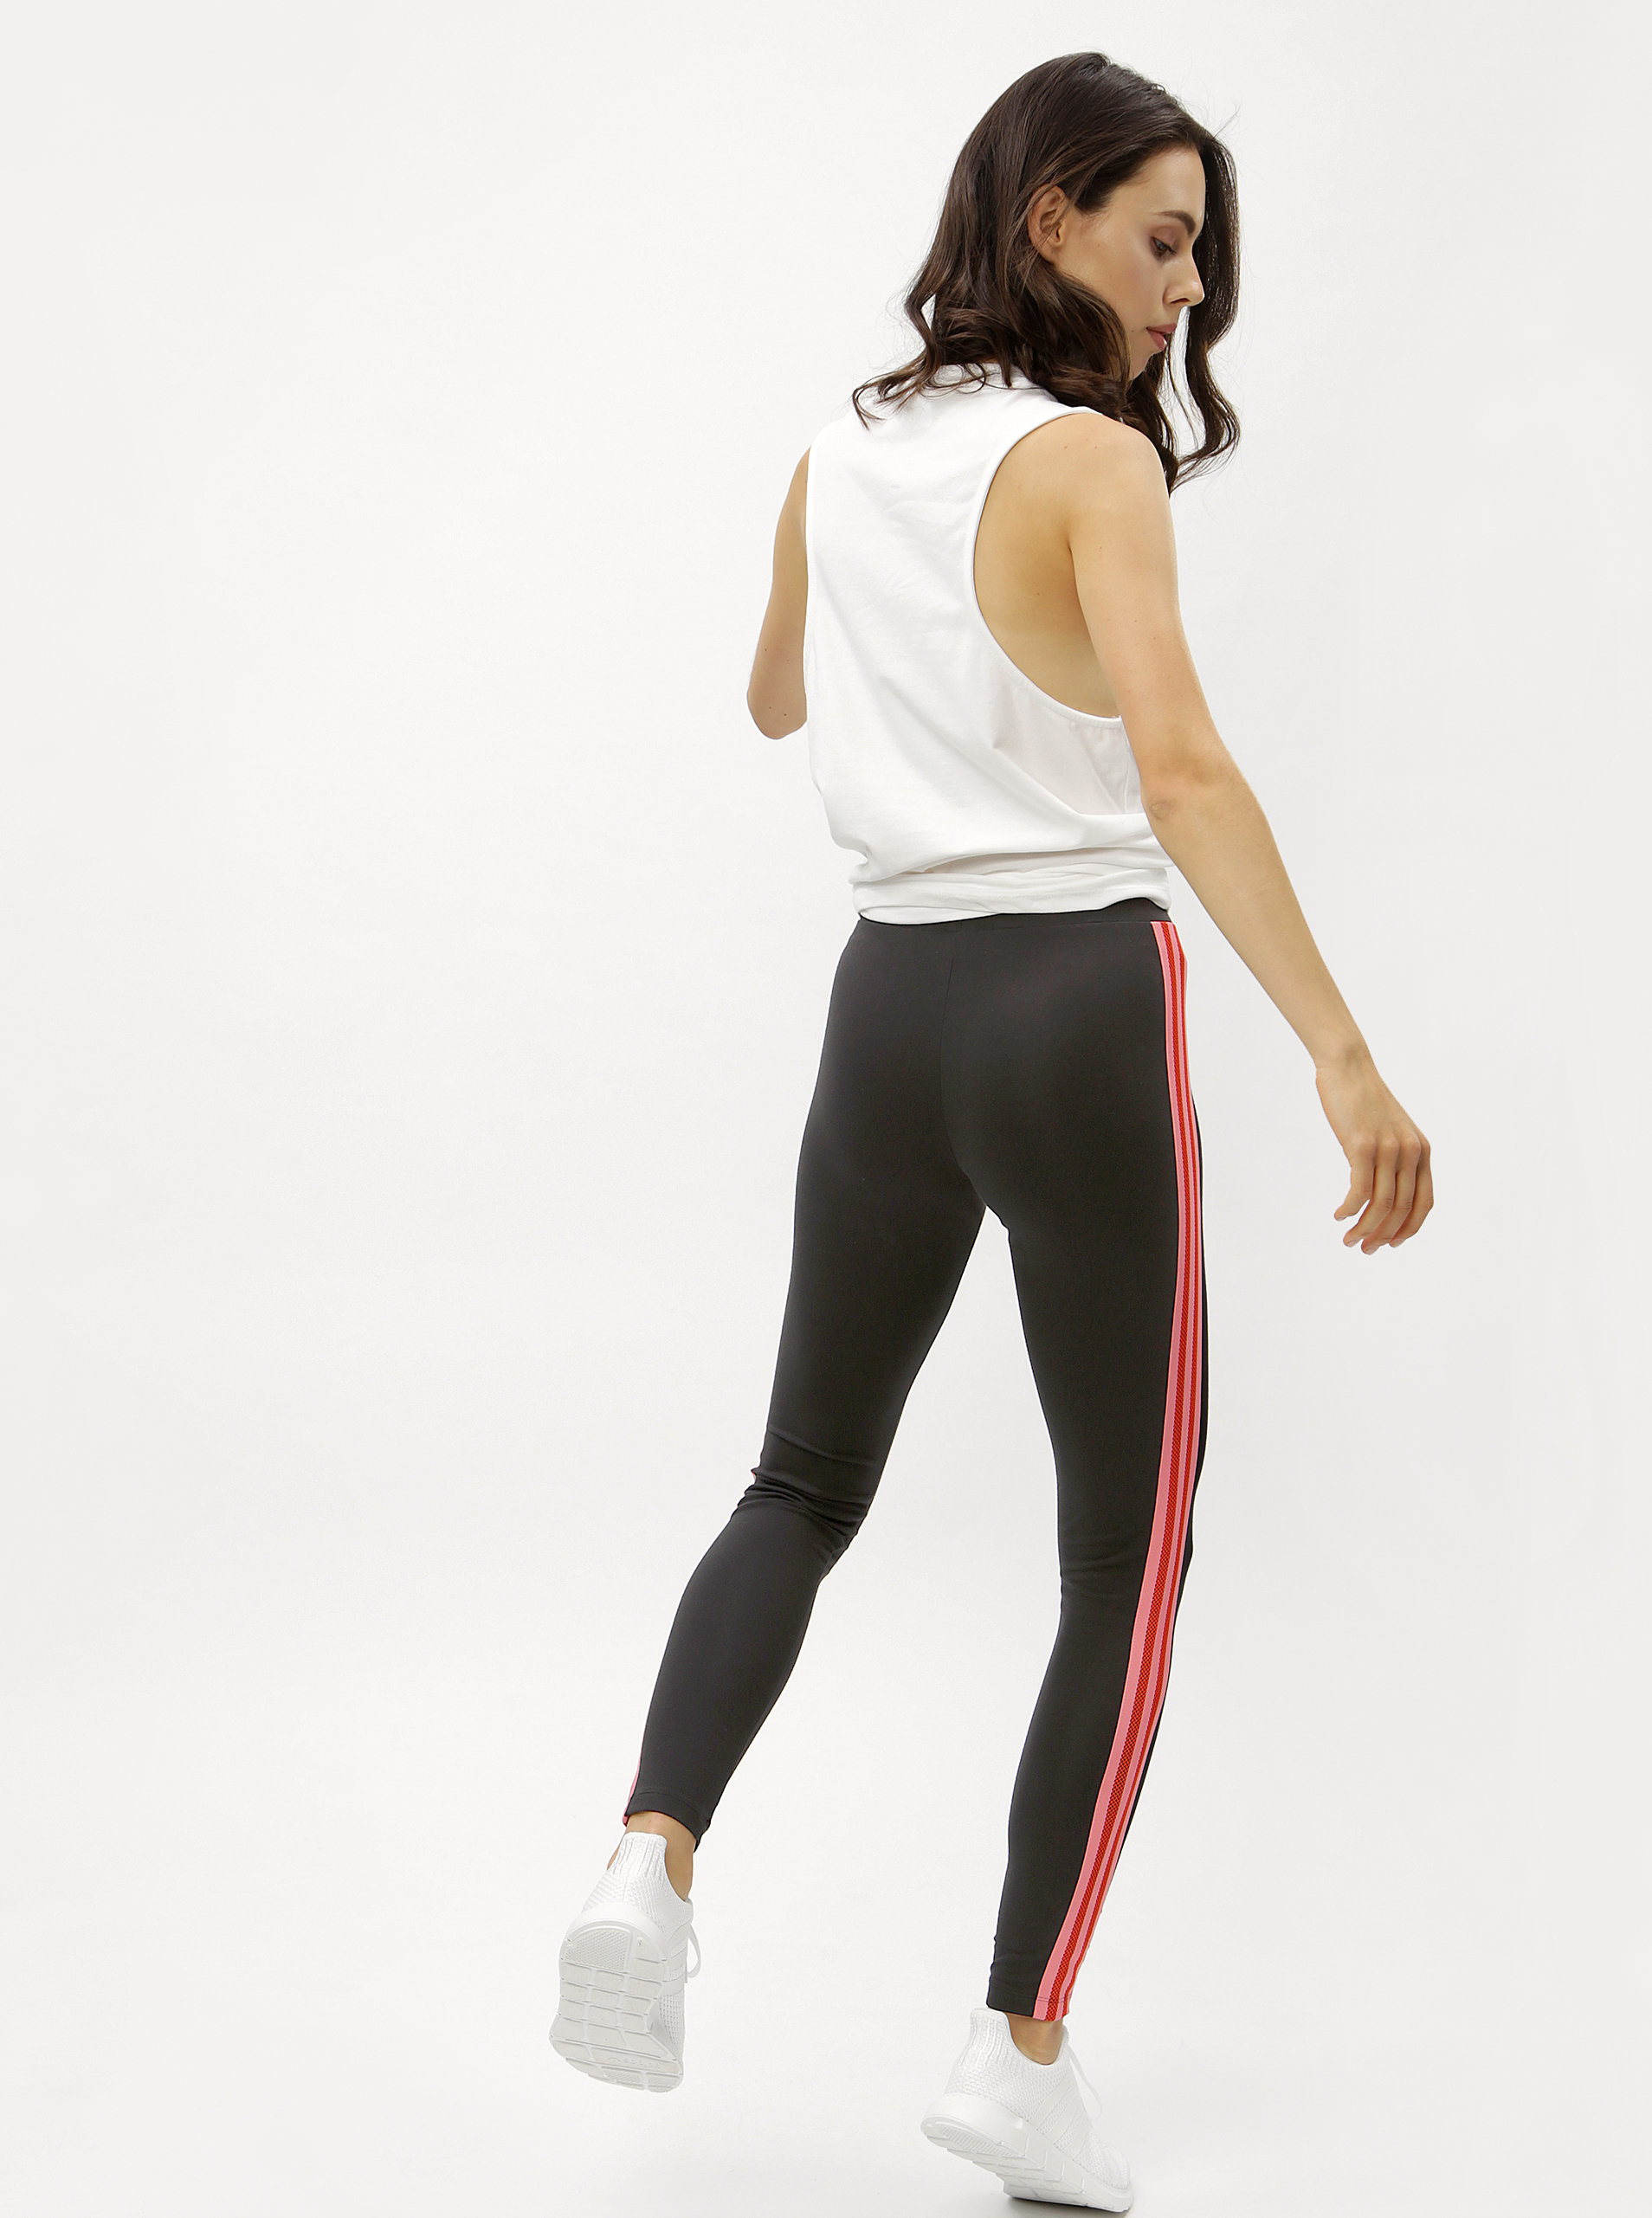 987d545f7fd9 Čierne dámske legíny s pruhmi adidas Originals ...